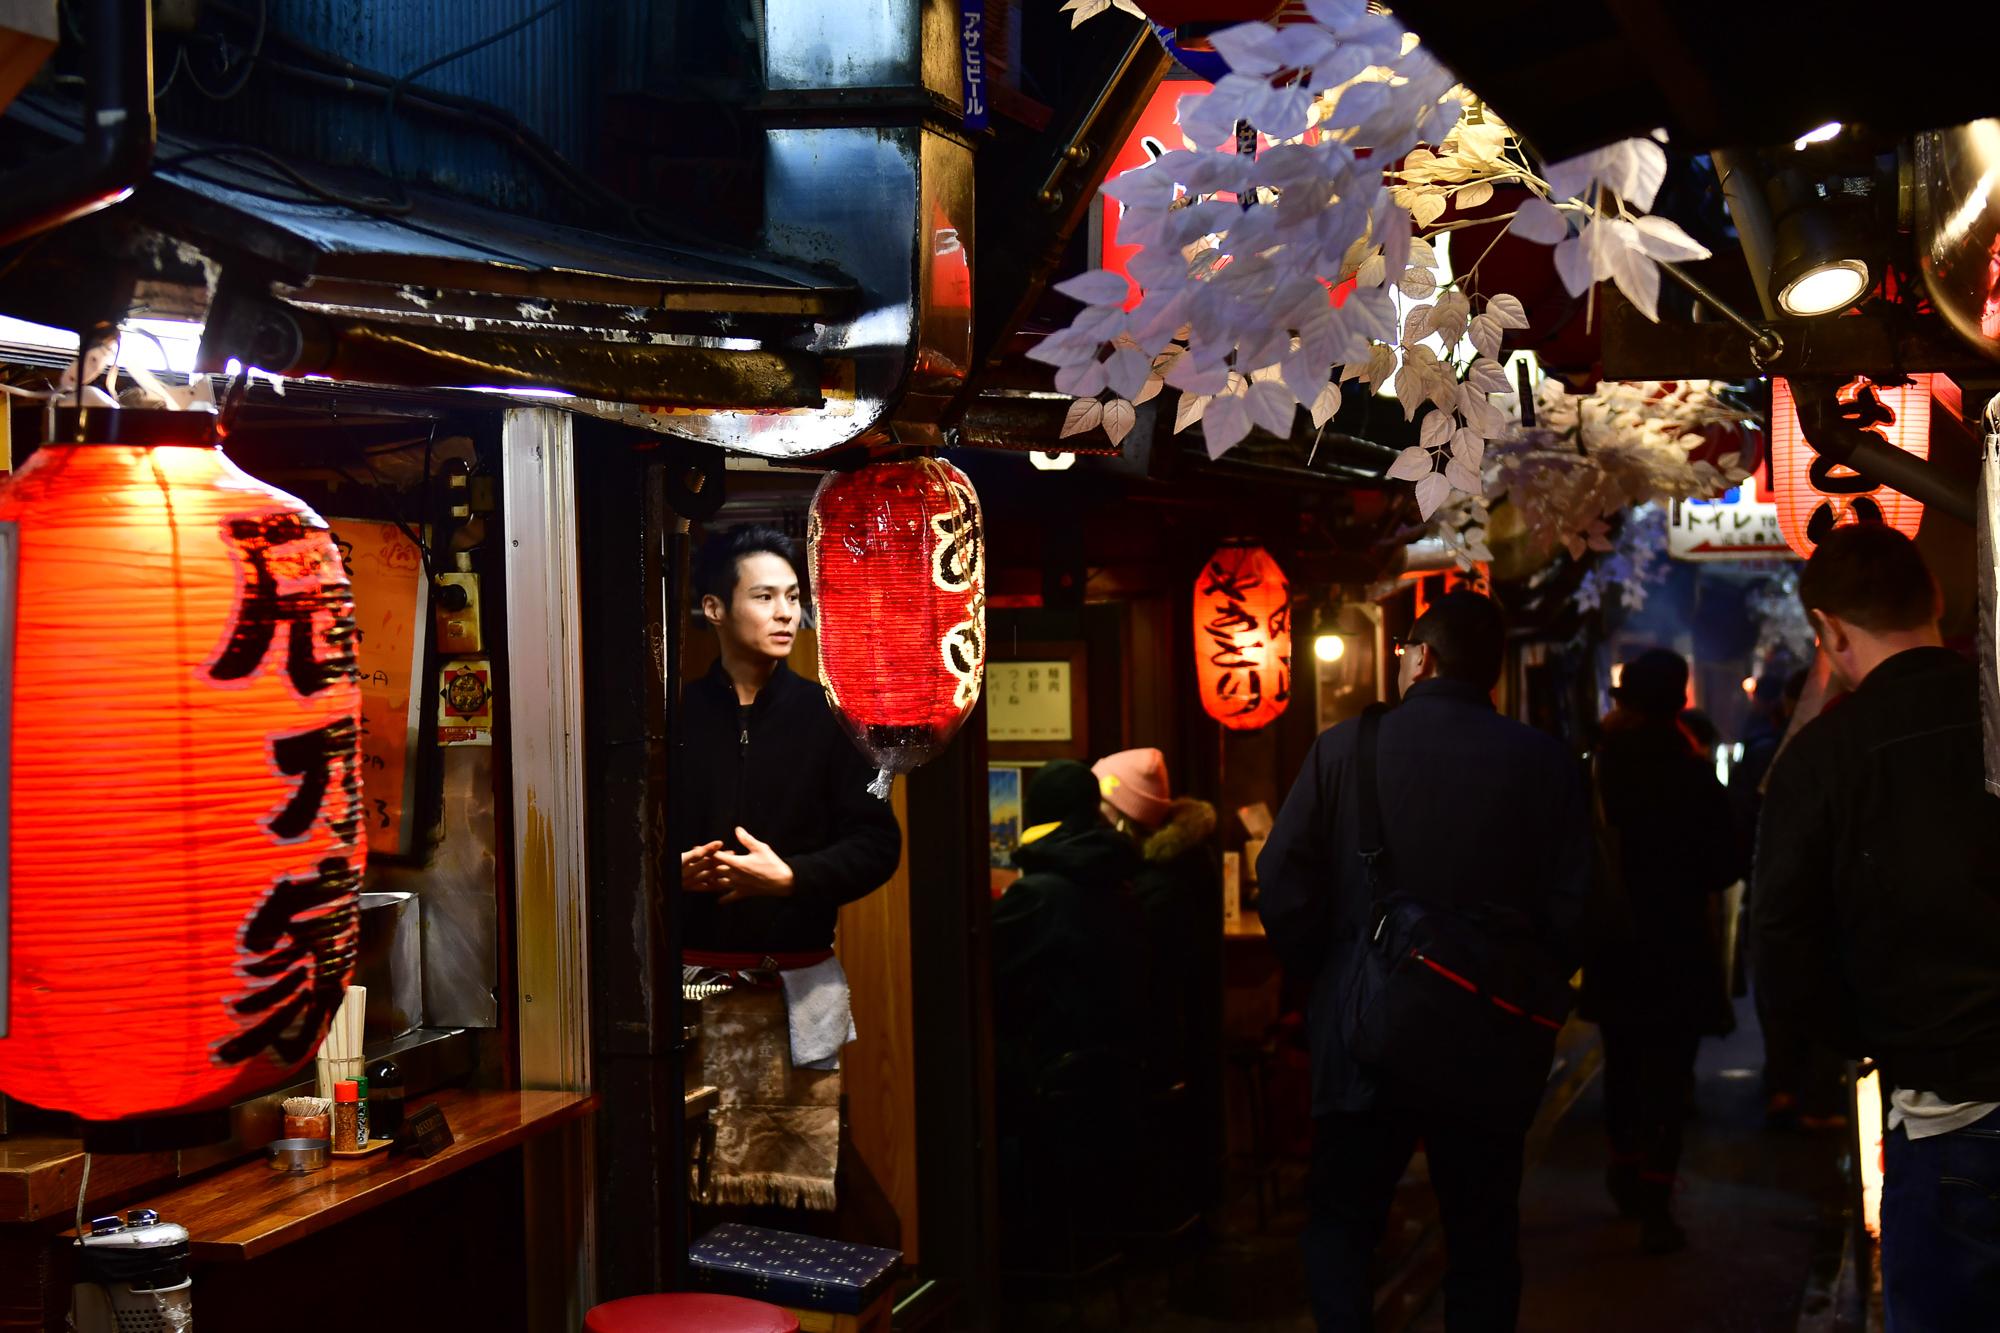 aperture-tours-tokyo-012.jpg